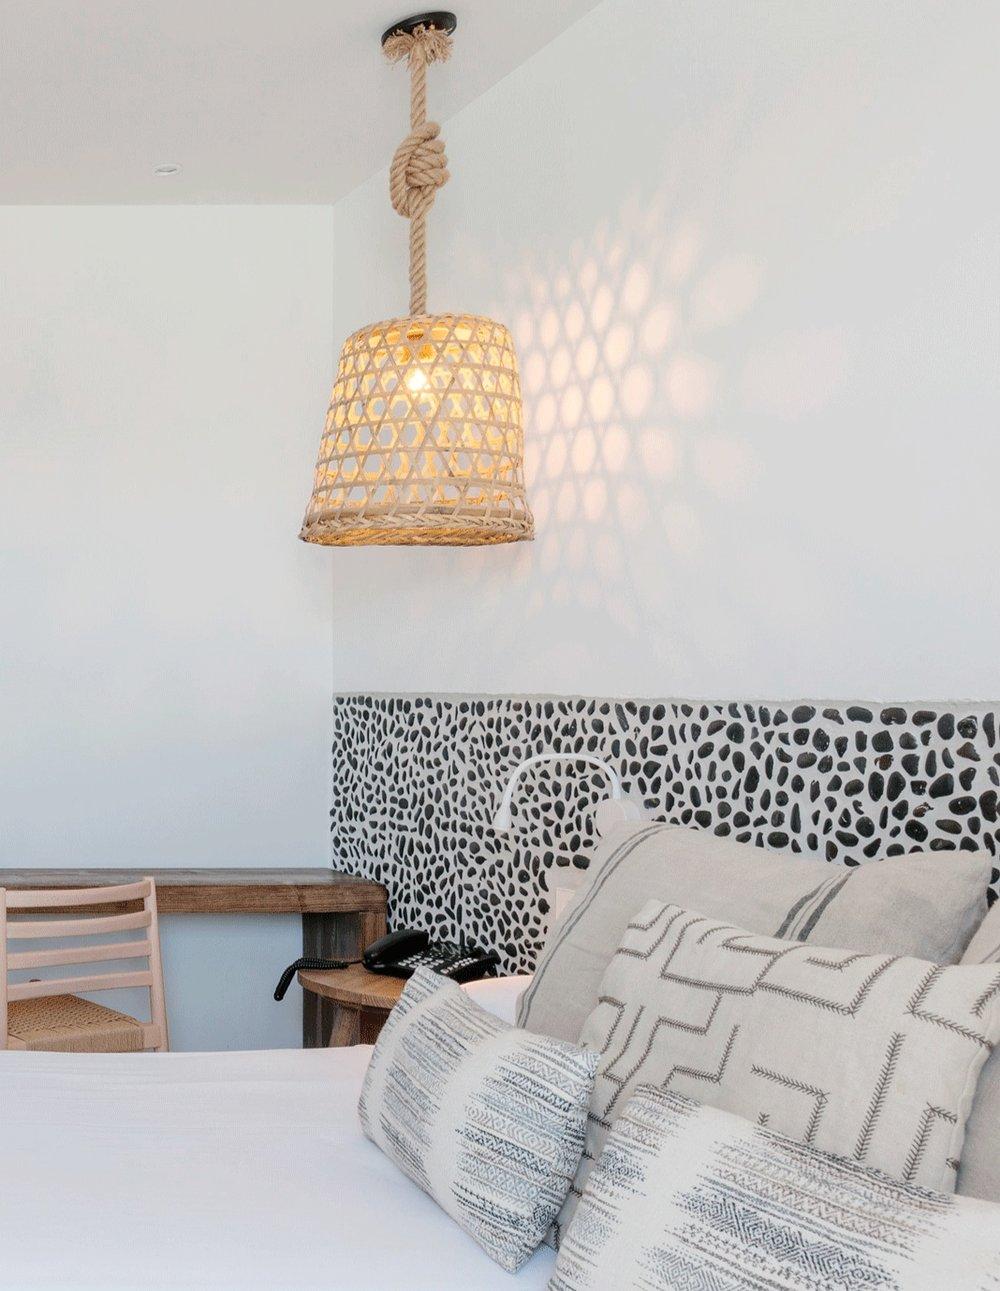 Lámpara Bambú  / Proyecto de Paula Téllez + Fotografía de Jaume Rebassa.